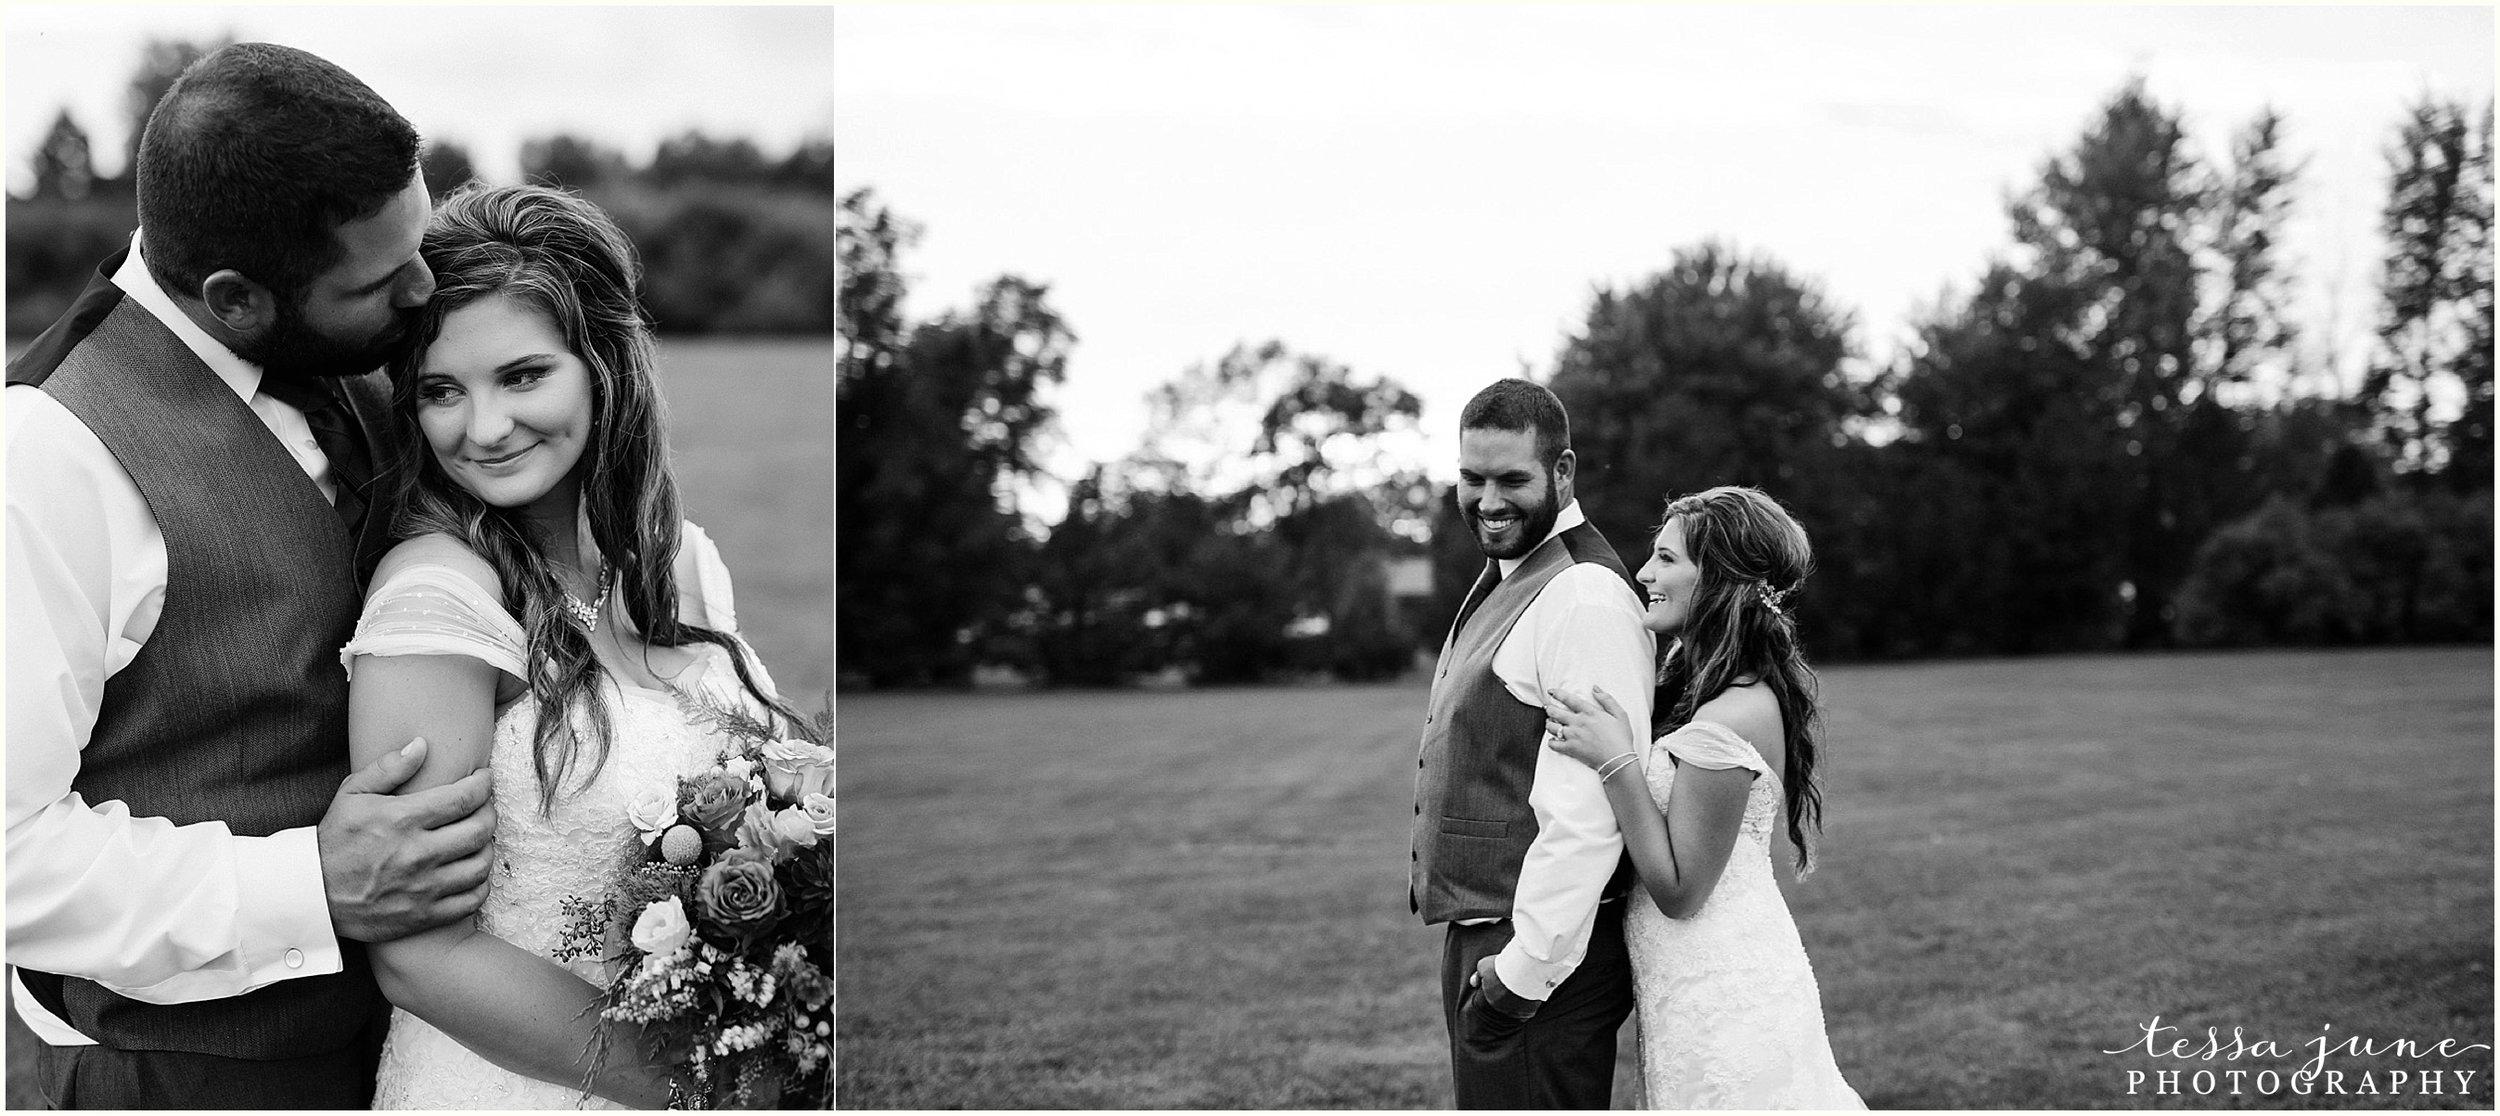 bohemian-minnesota-wedding-mismatched-bridesmaid-dresses-waterfall-st-cloud-tessa-june-photography-186.jpg